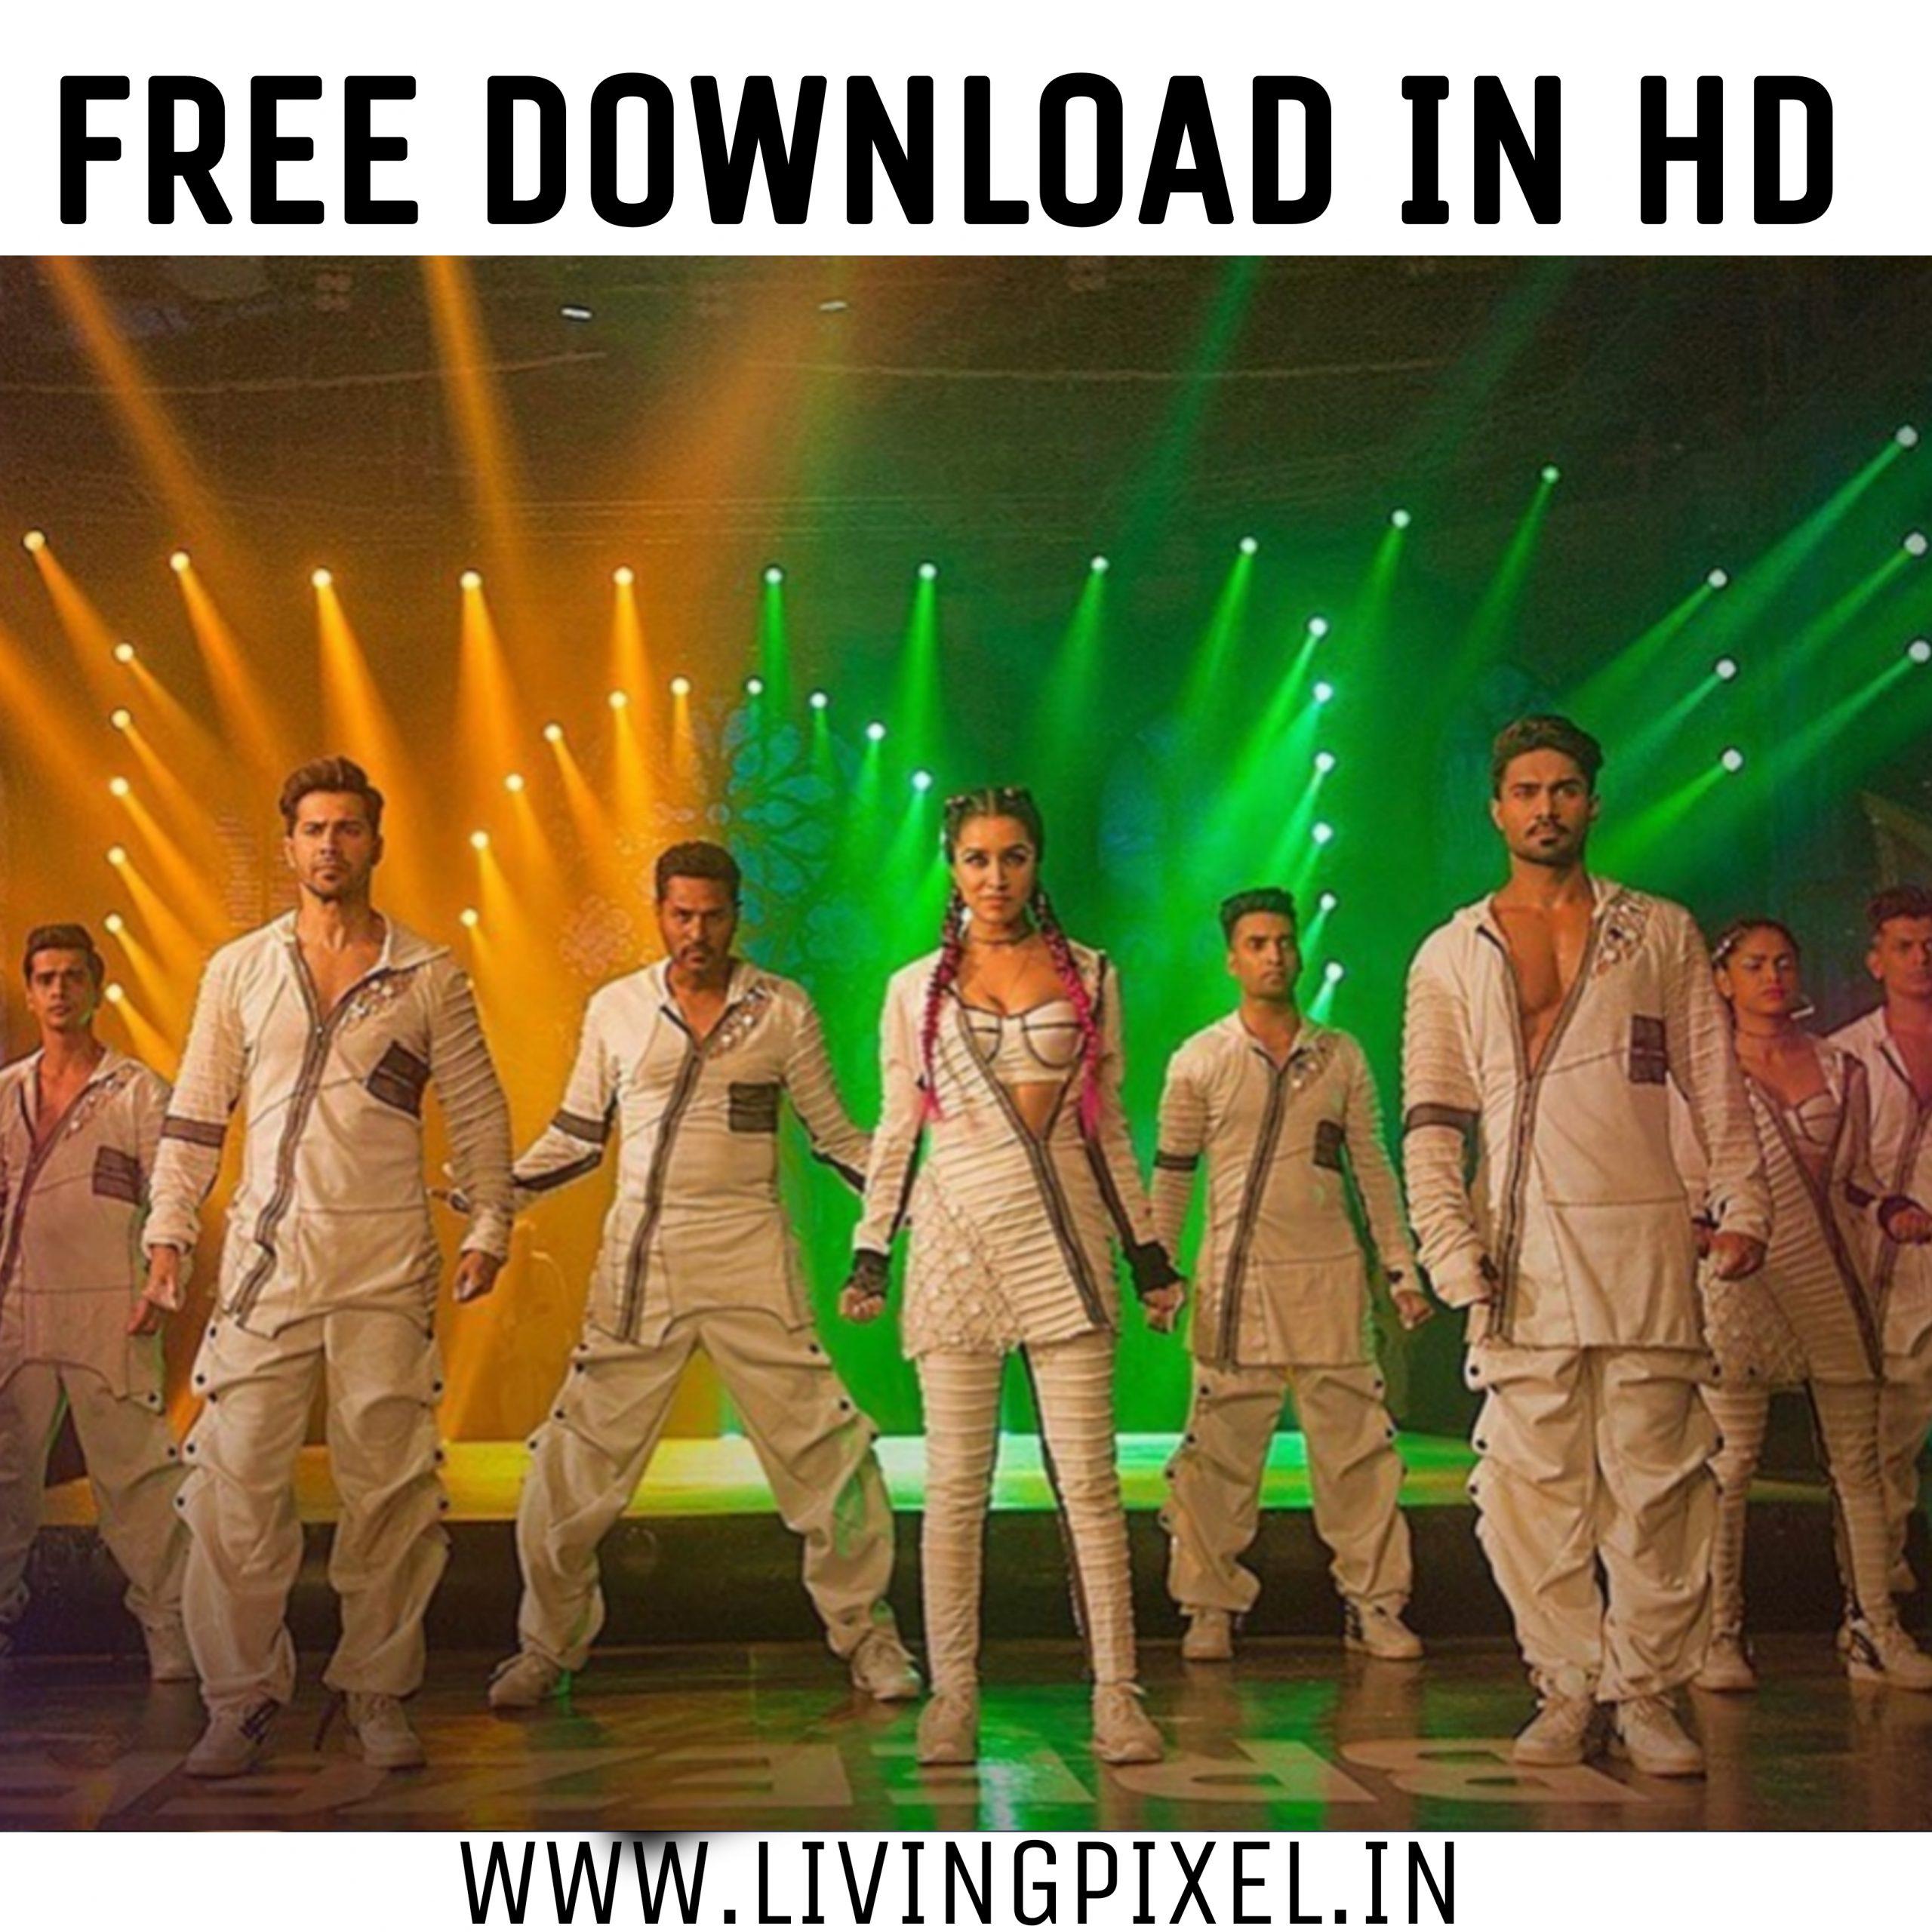 Street Dancer 3D full movie download Worldfree4u in HD